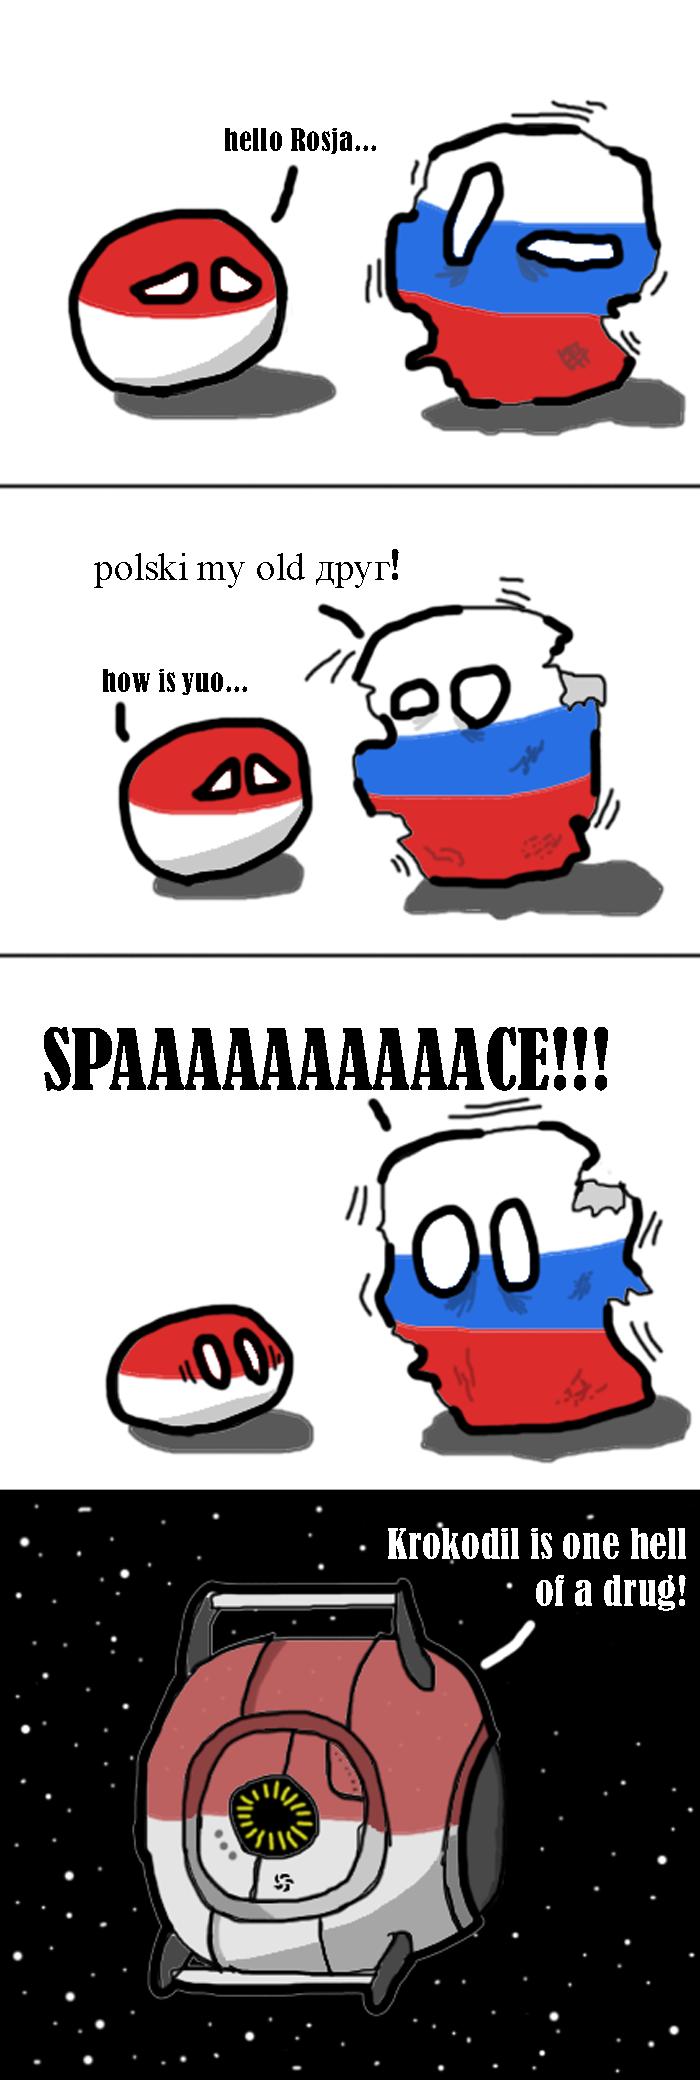 Russia on Drugs. r/polandball. hell!) Itallic, ll y tta Polski my old ,. tts 1: sls 1 : l( 1' 01{ stlil is one hell